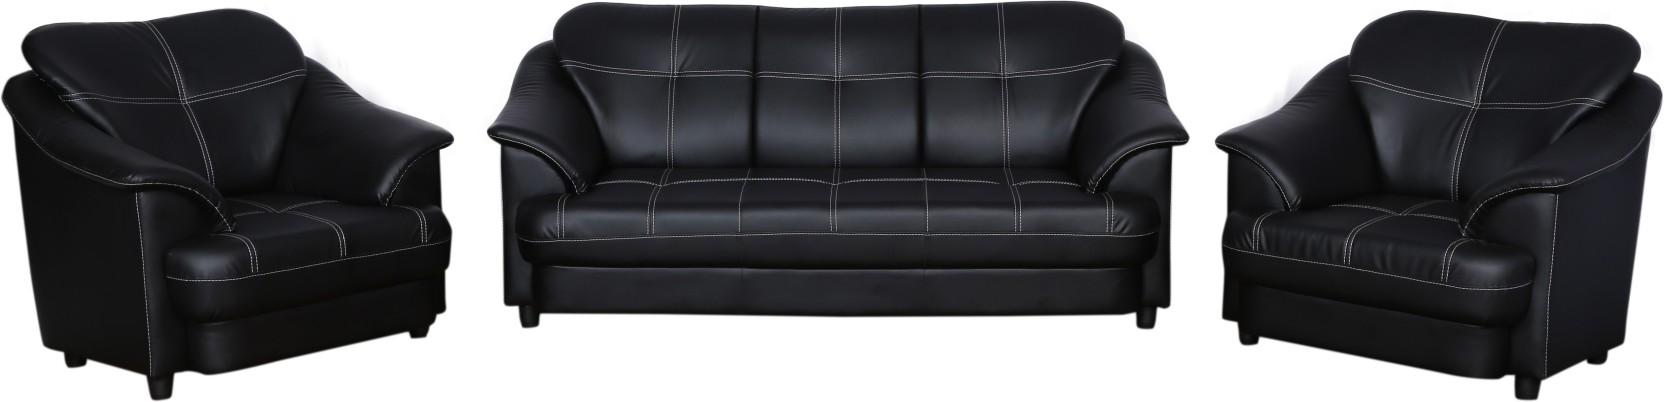 Master Kraft Titanic Leatherette 3 1 1 Black Sofa Set Price In